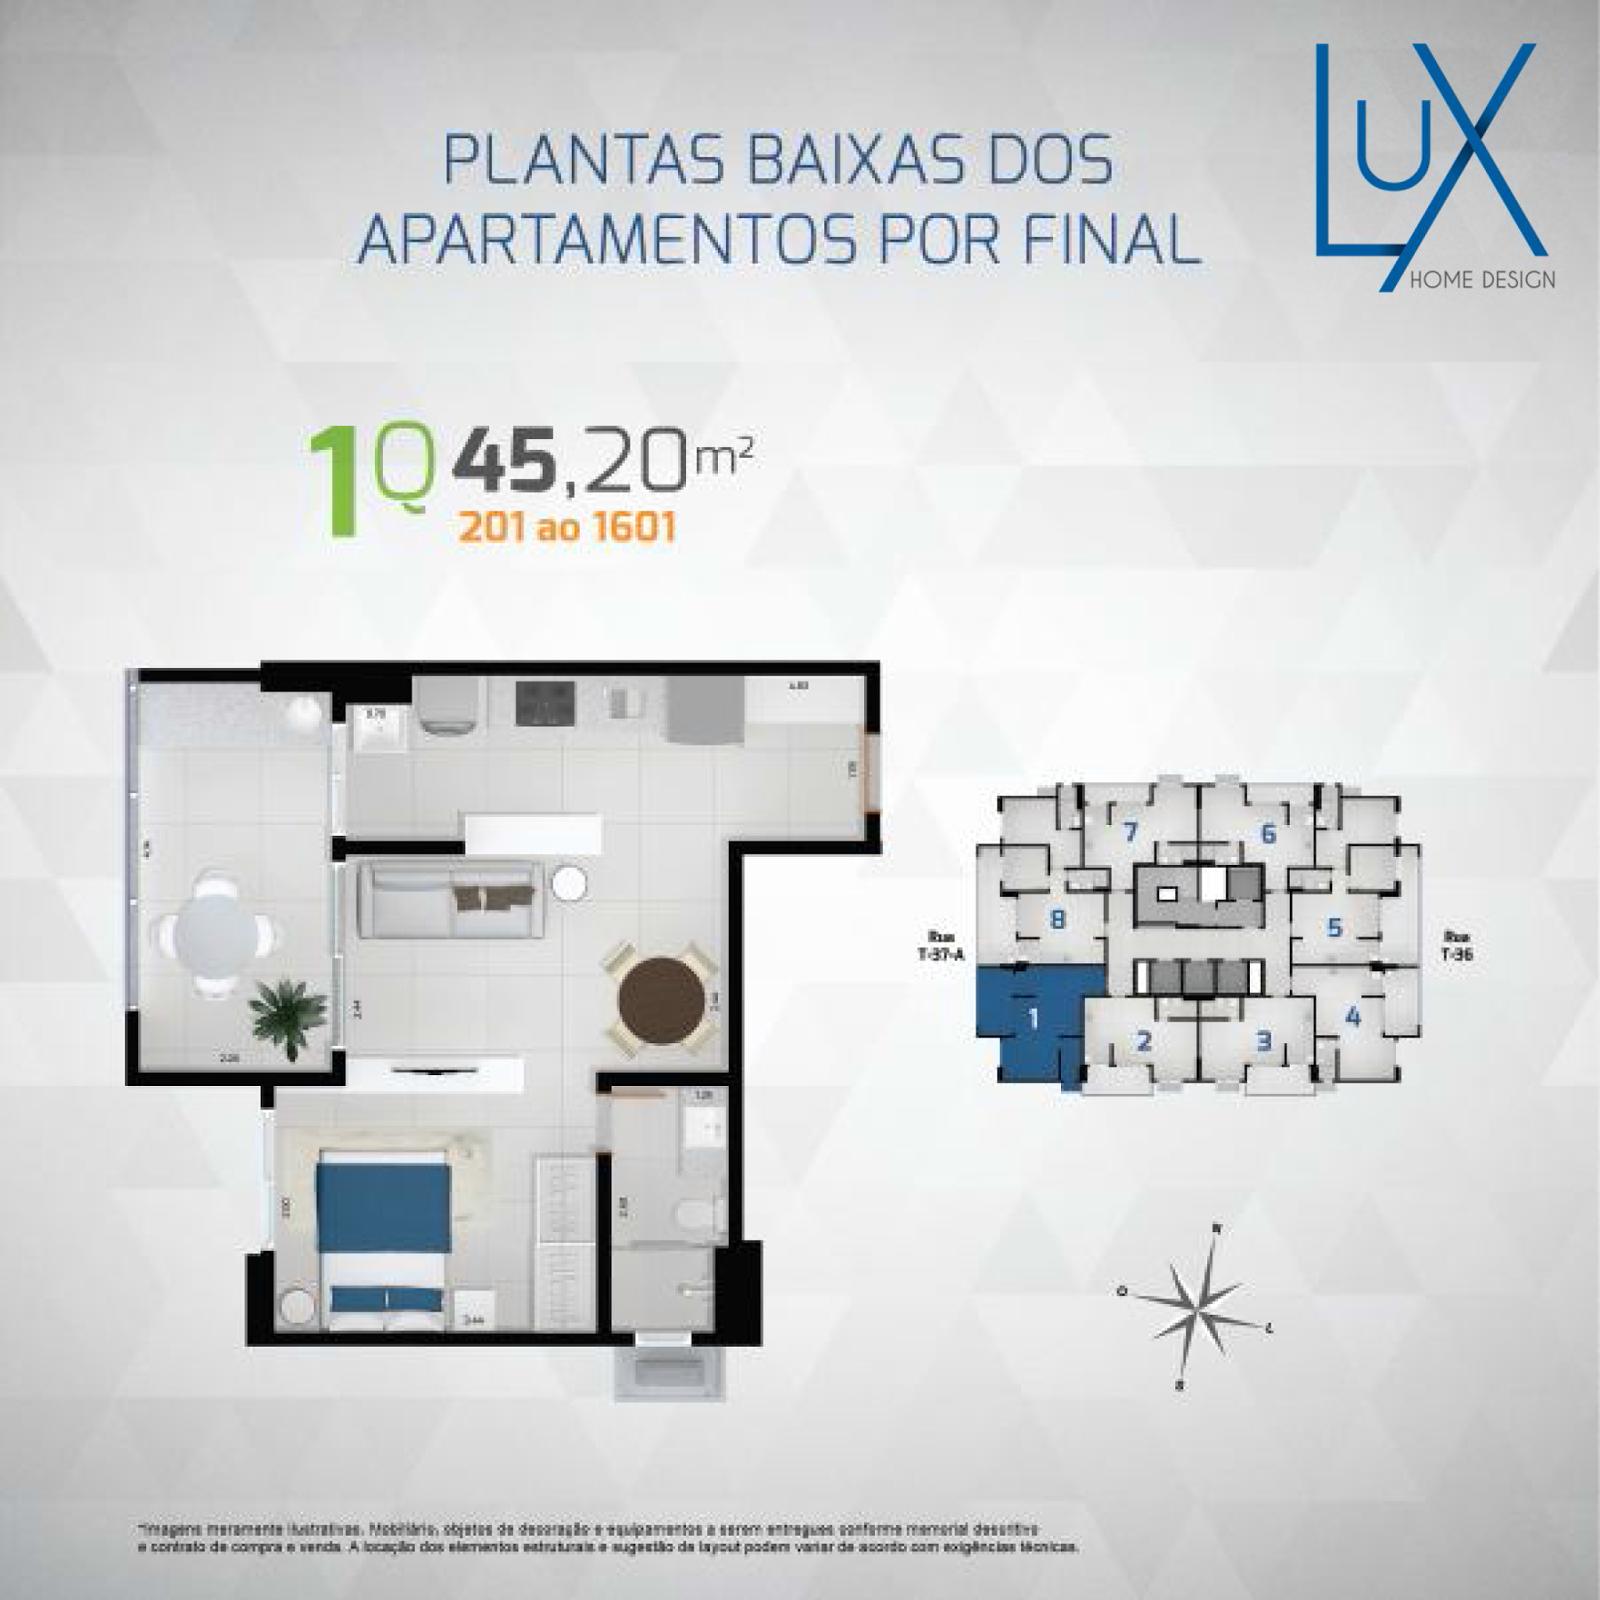 Awesome Lux Home Design Ideas - Decoration Design Ideas - ibmeye.com